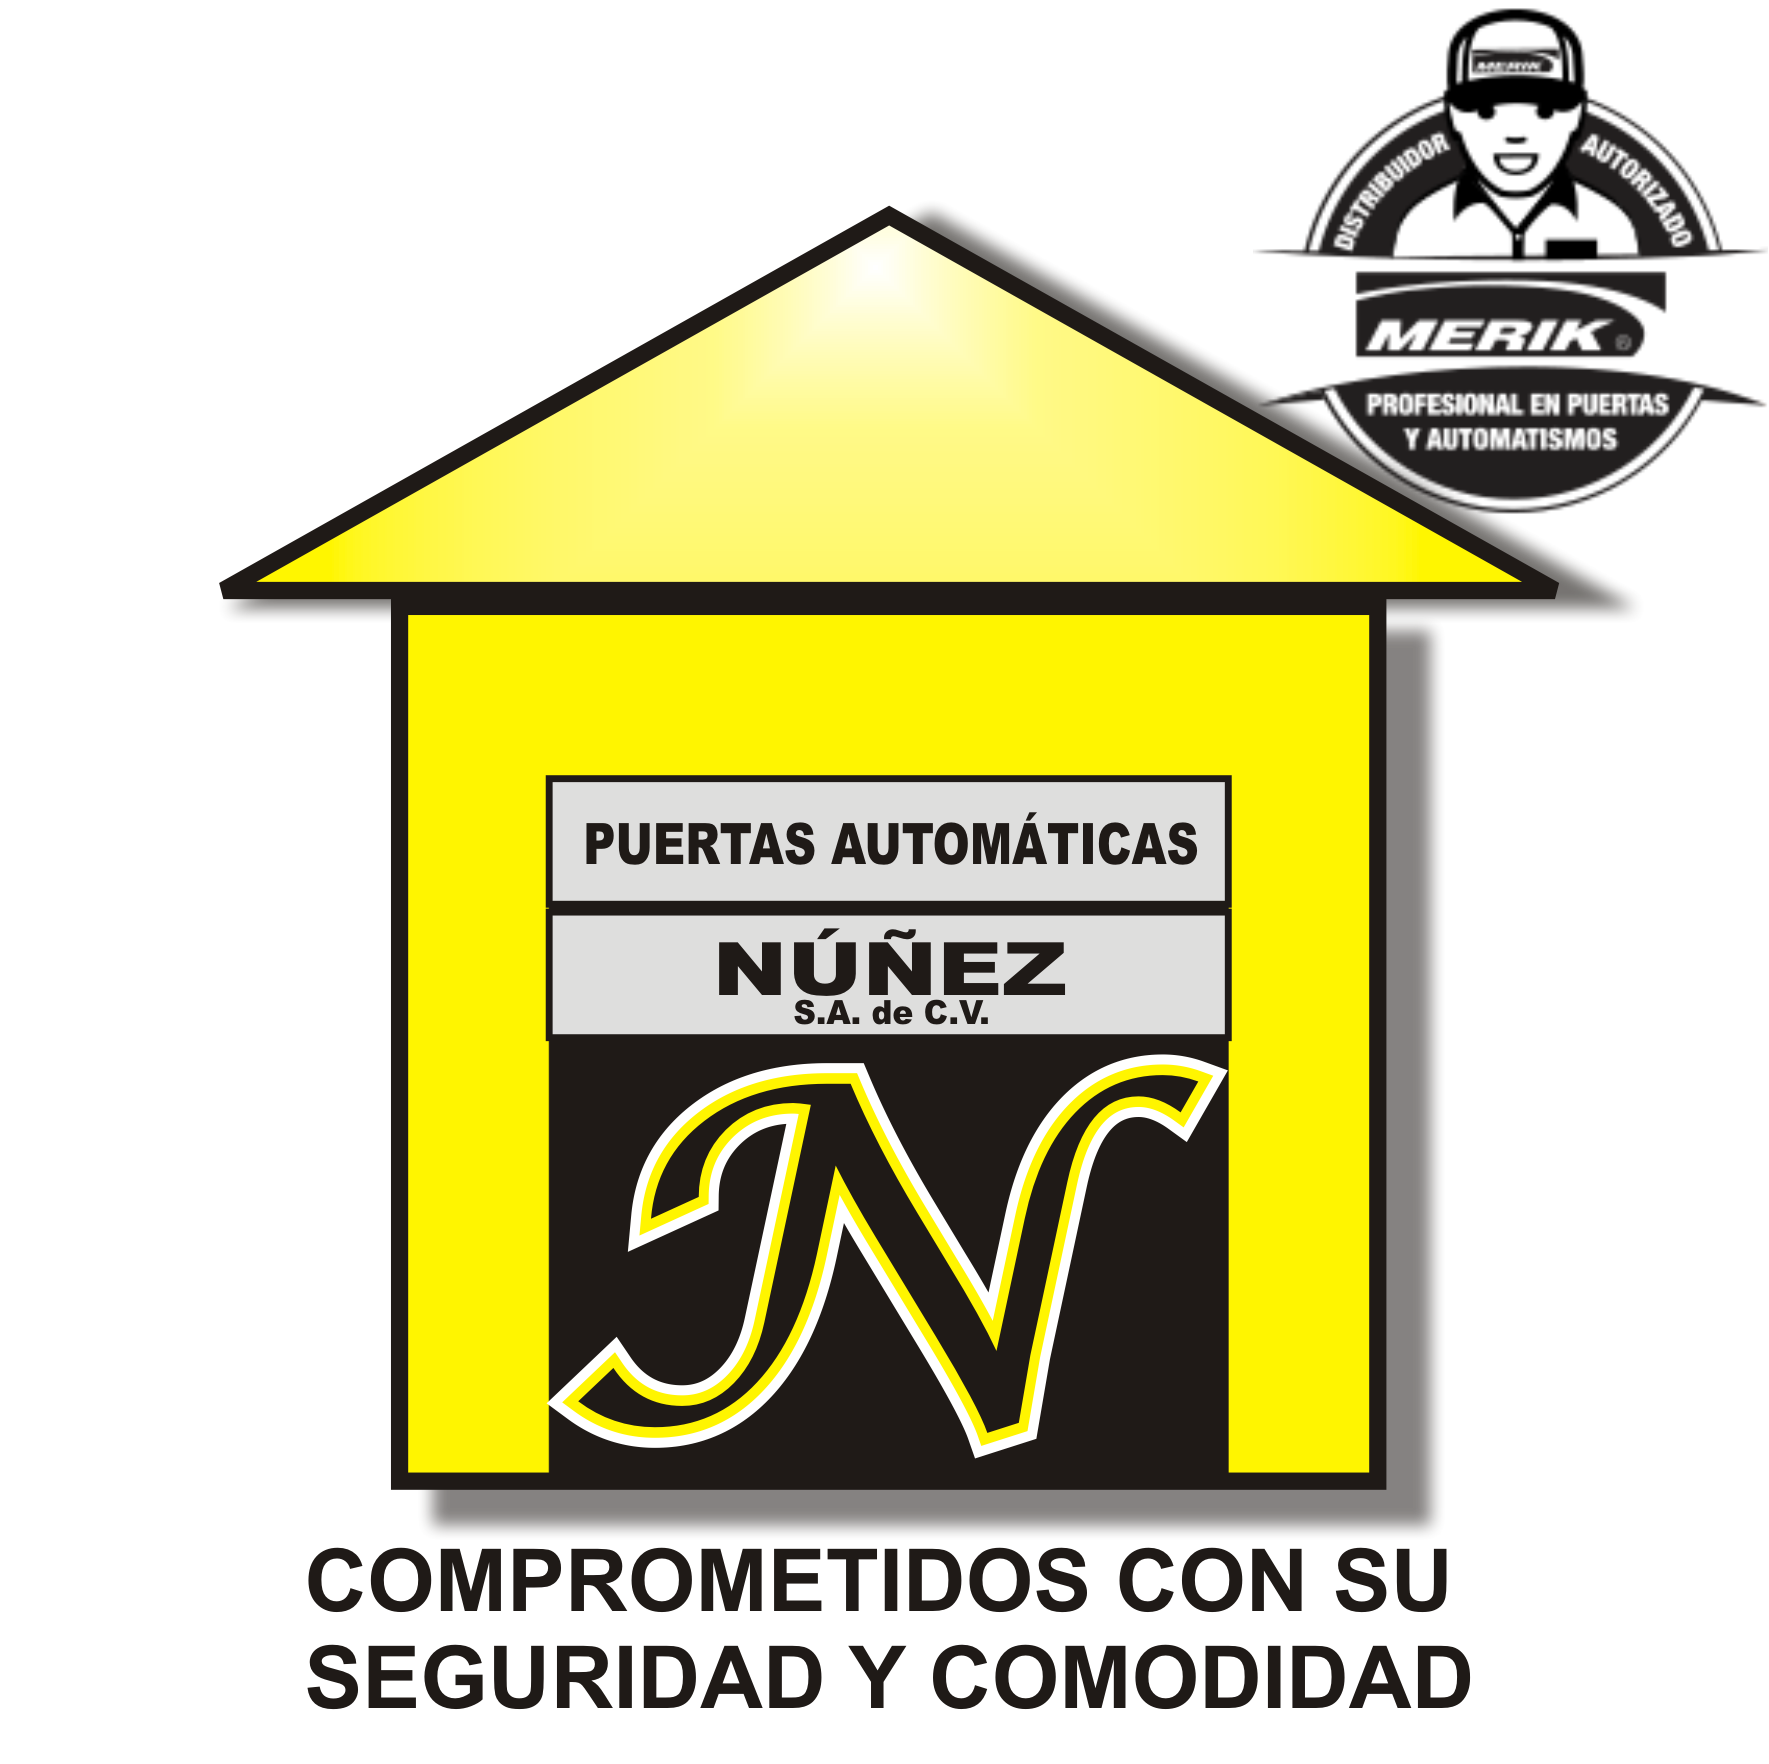 Puertas Automáticas Núñez